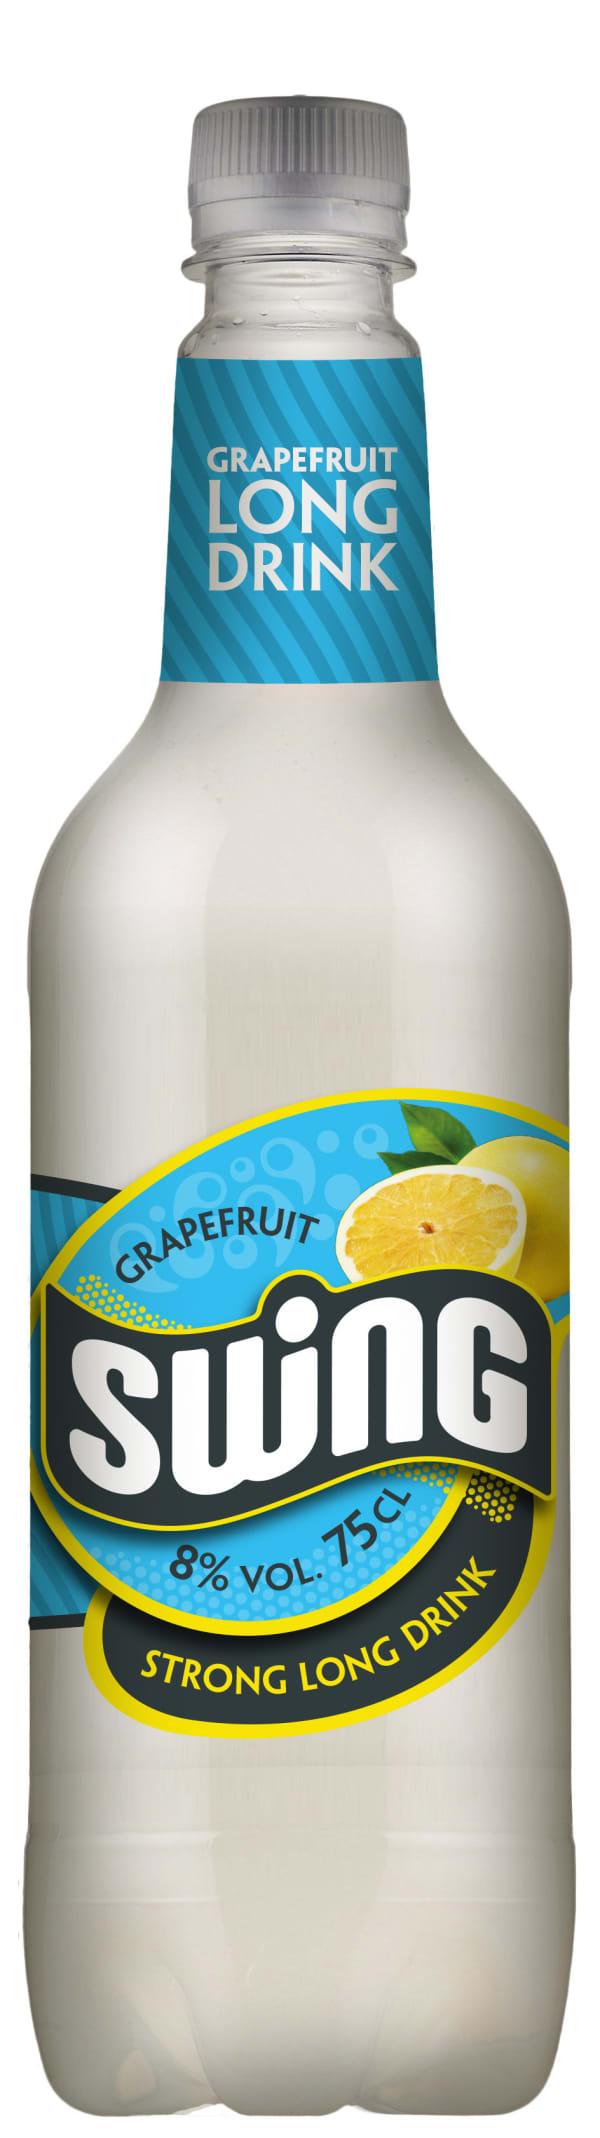 Swing Grapefruit Strong Long Drink plastic bottle